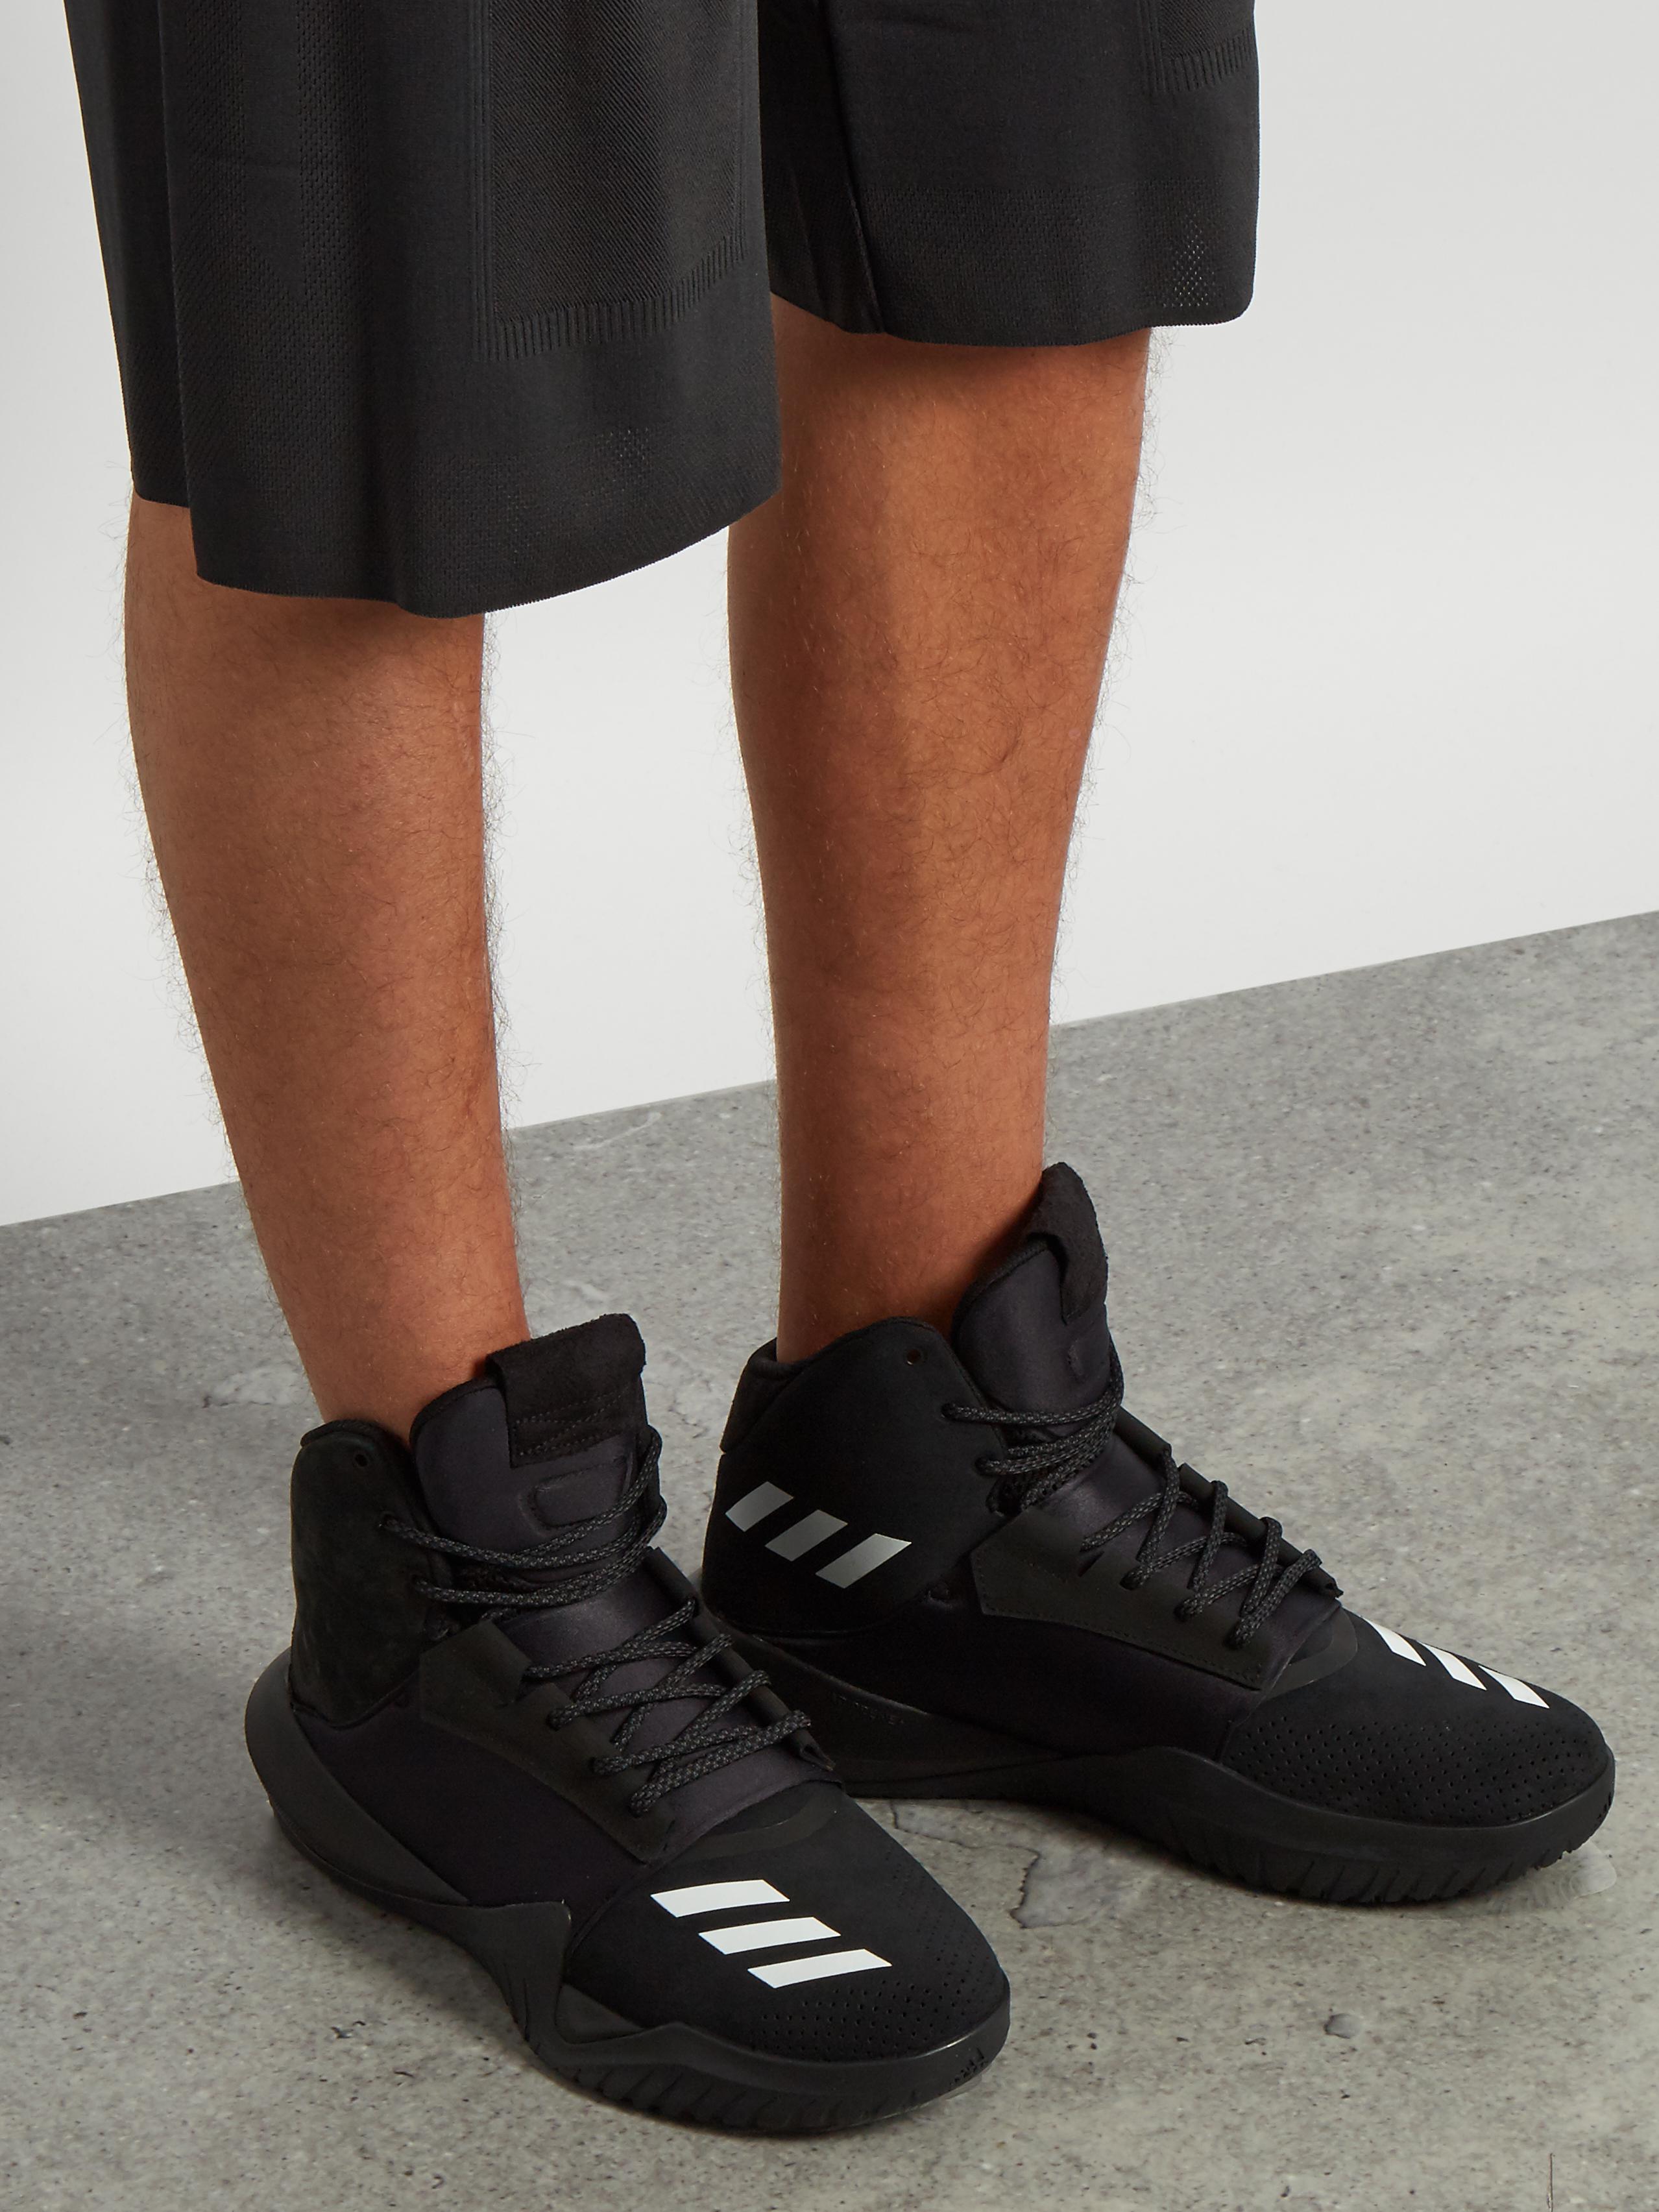 3601c8f20 adidas Originals Ado Crazy Team High-top Trainers in Black for Men ...